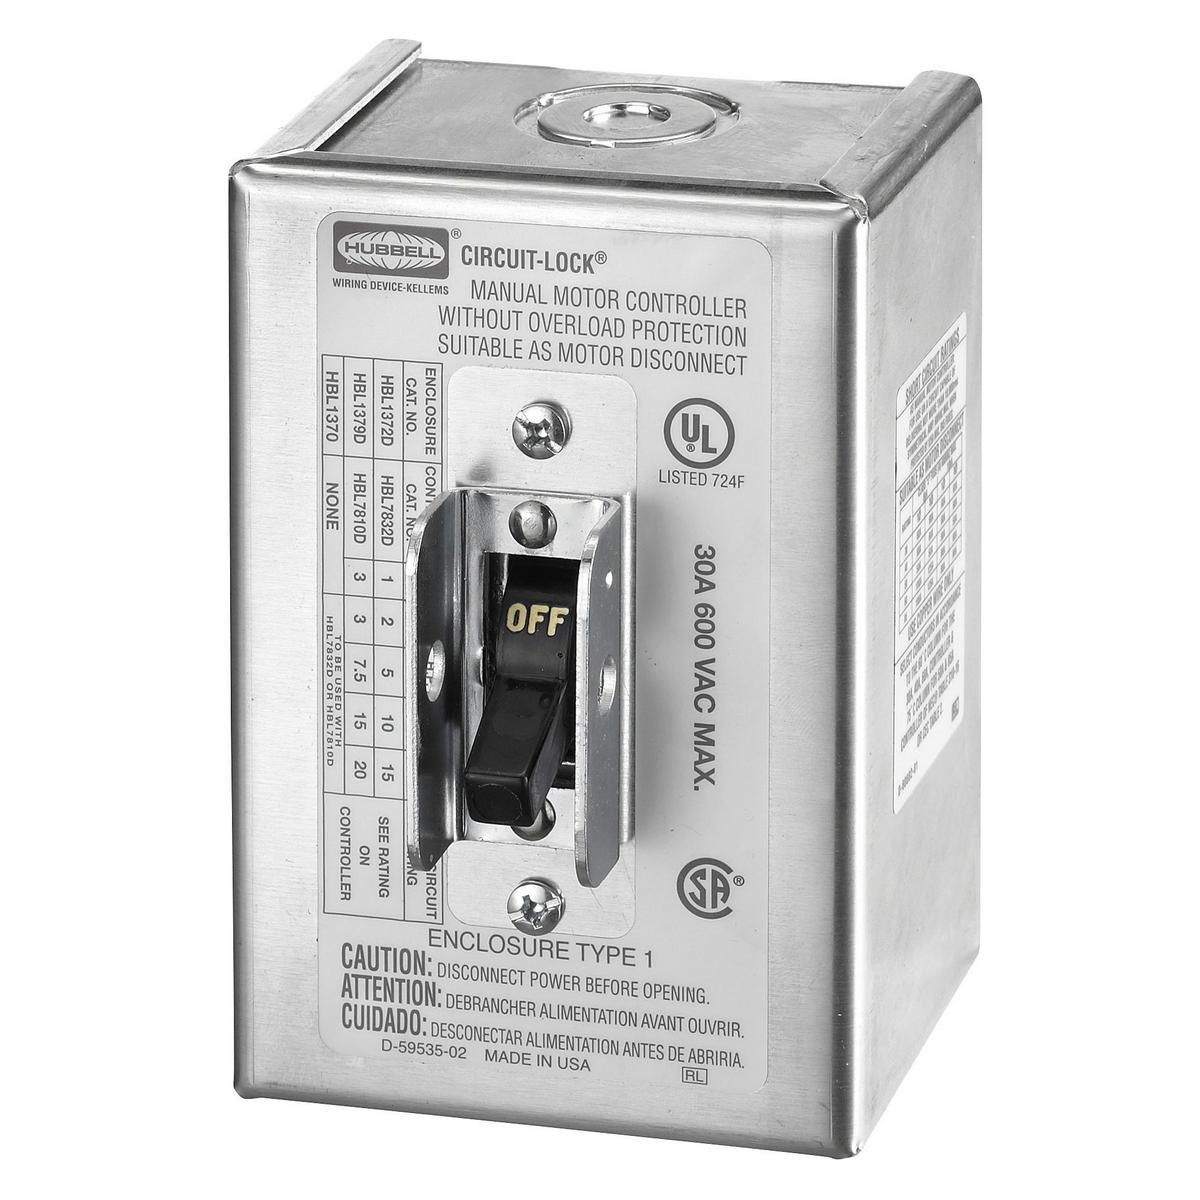 Hubbell HBL1370 30 Amp 600 VAC NEMA 1 Metallic Manual Motor Controller